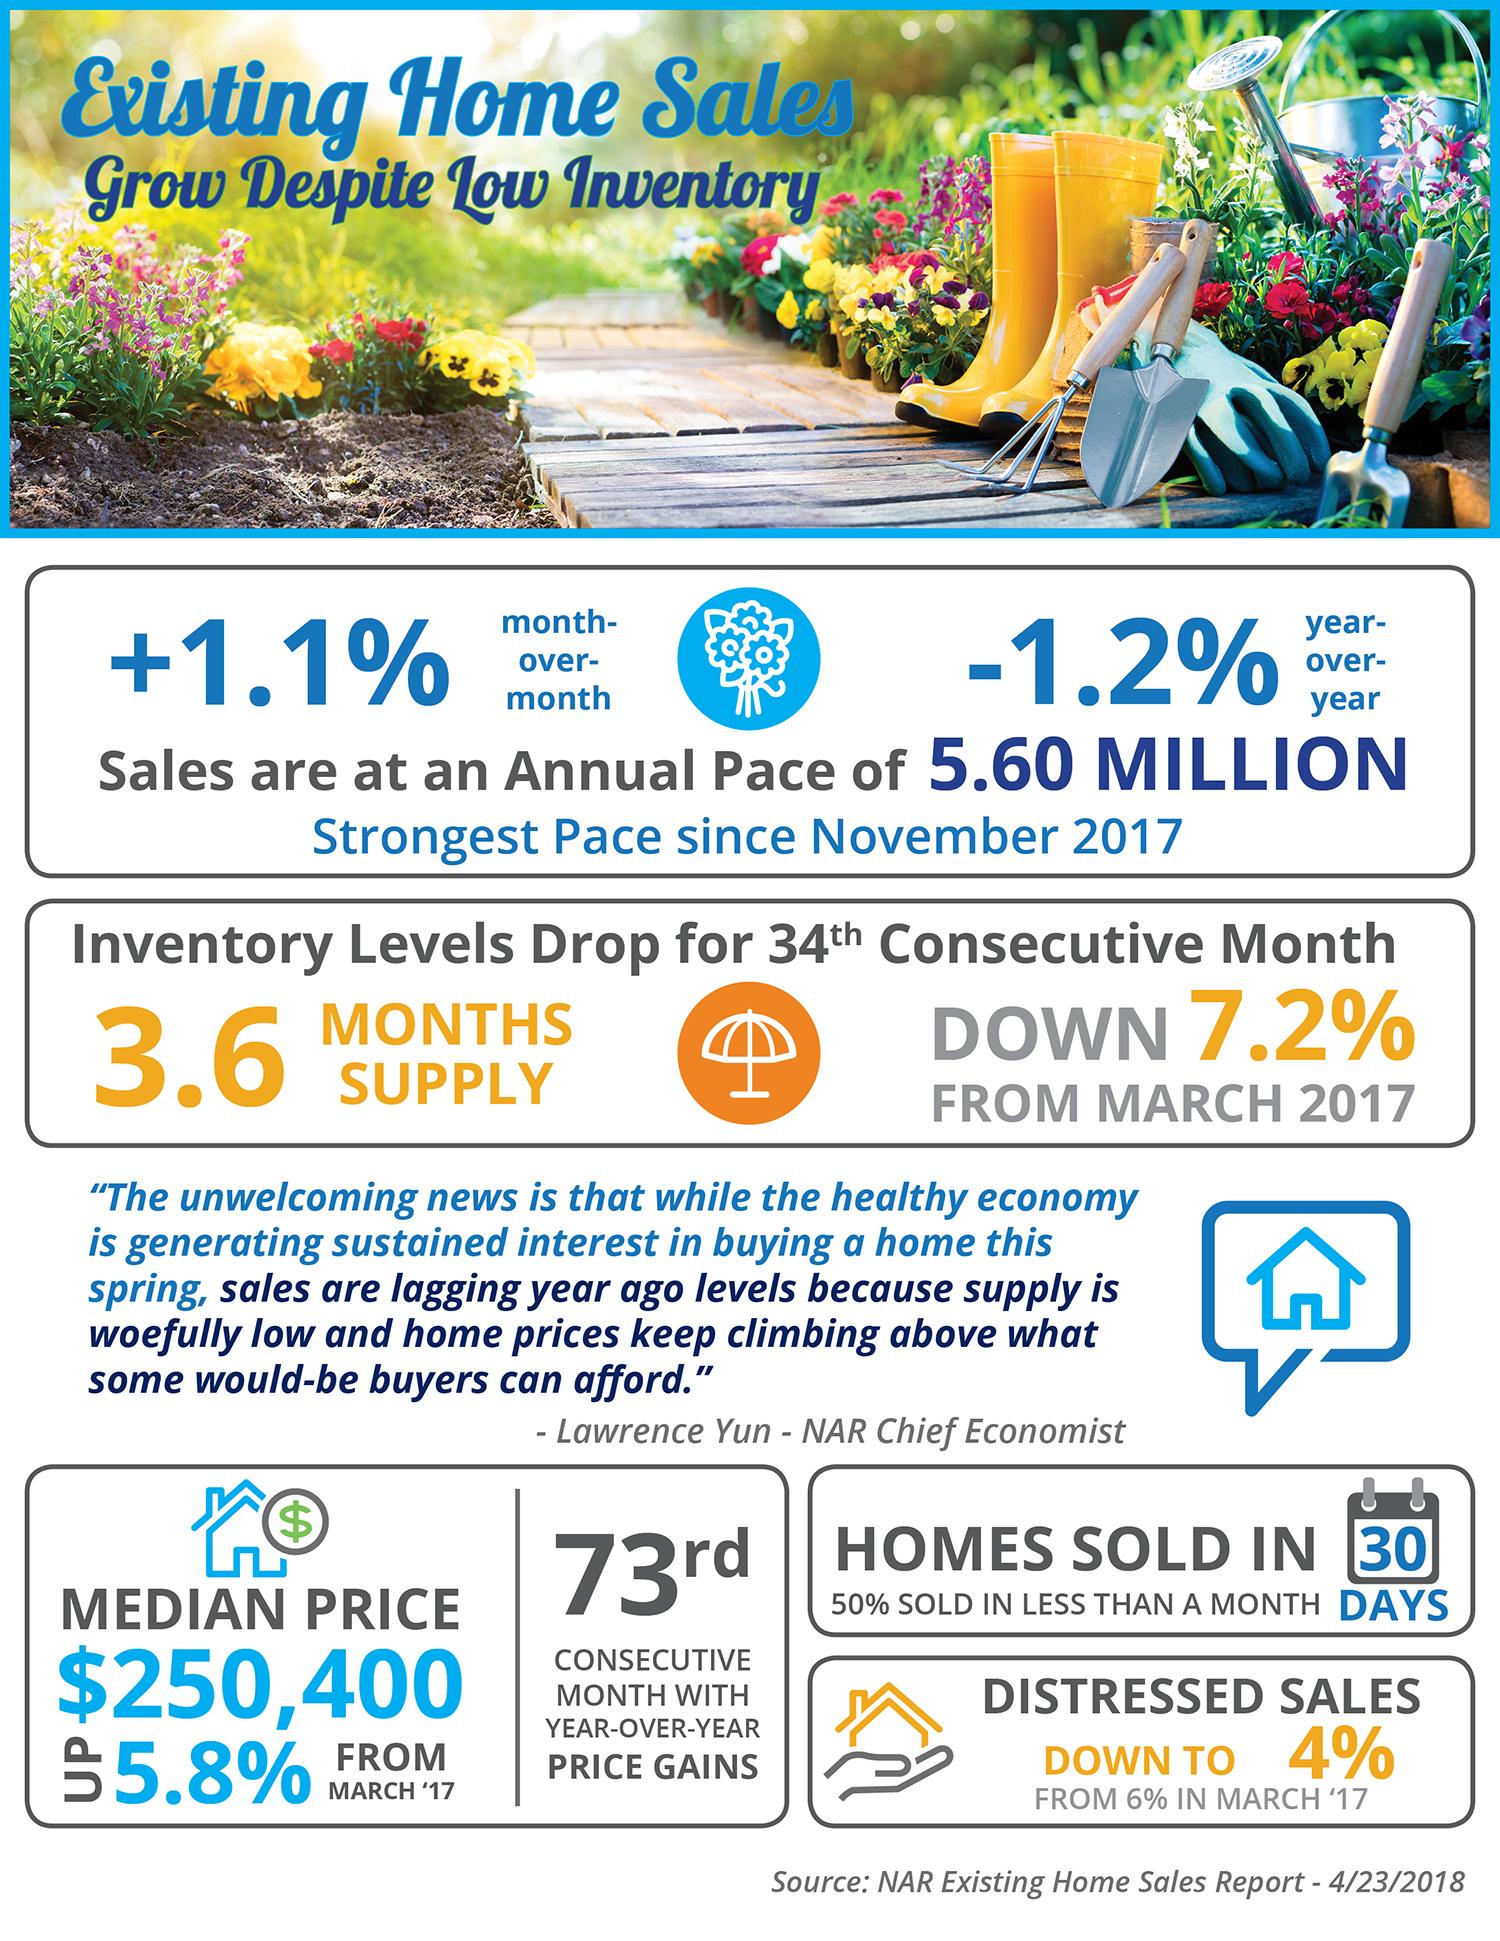 Home Sales Grow in Oregon Despite Low Inventory